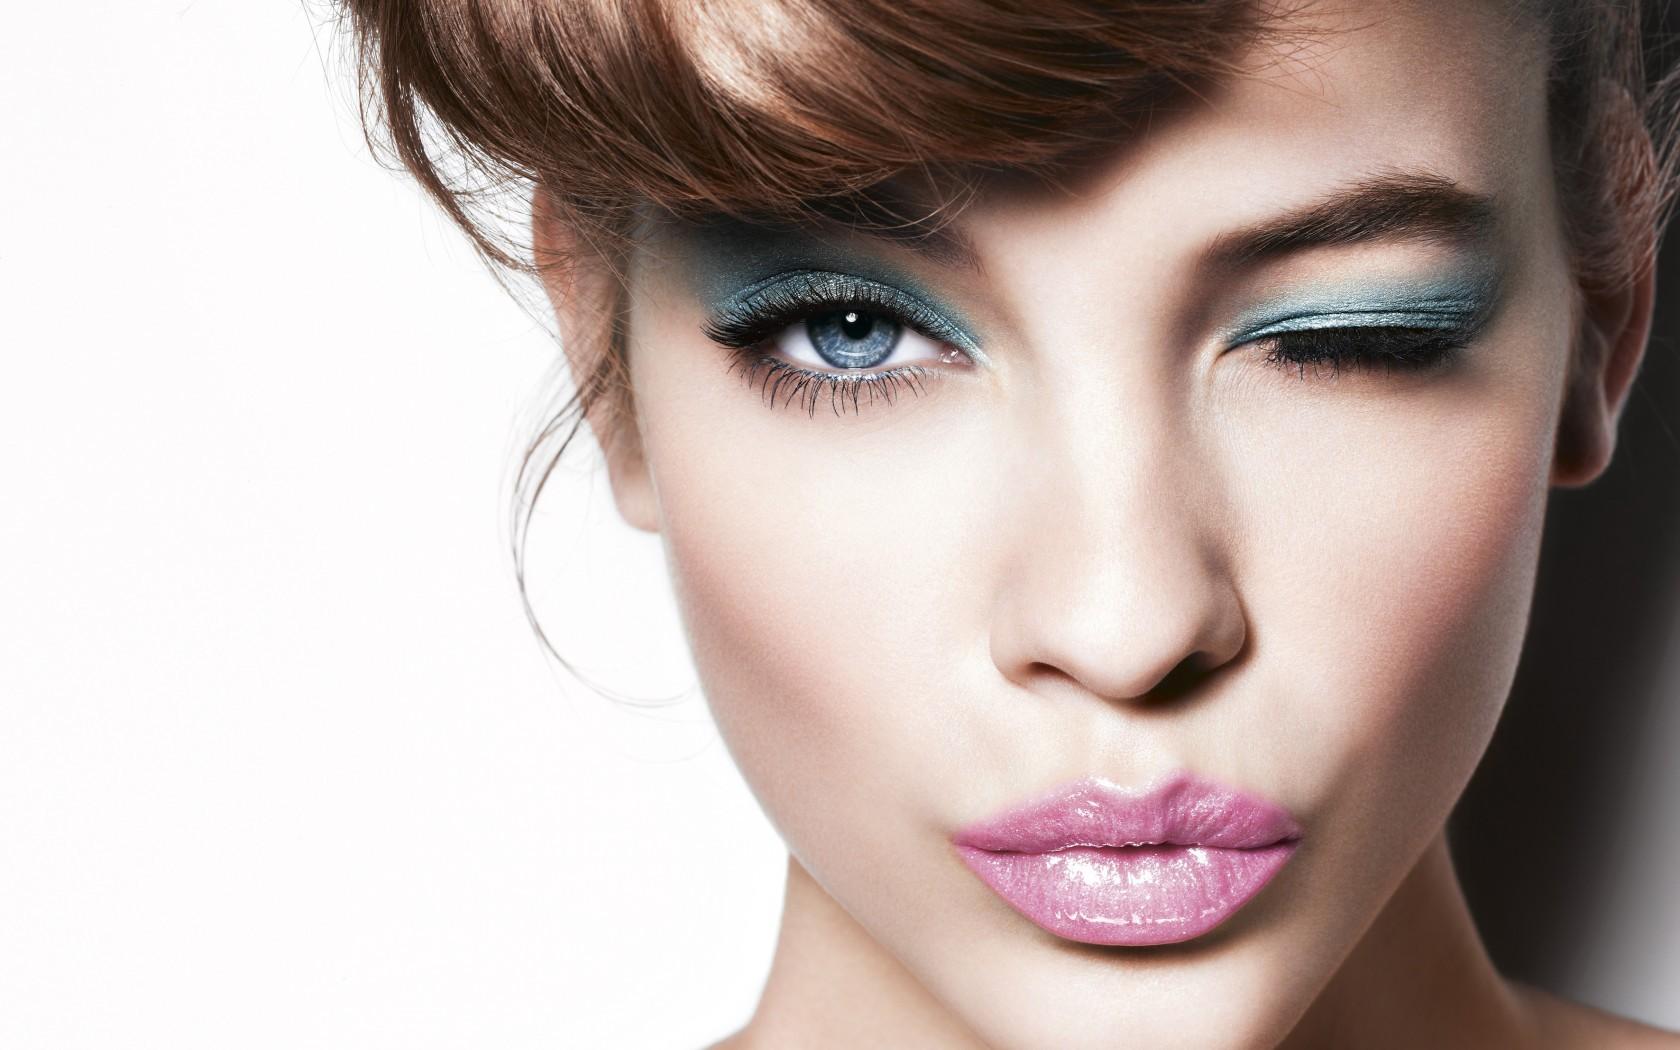 makeup-for-blue-eyes-4.jpg